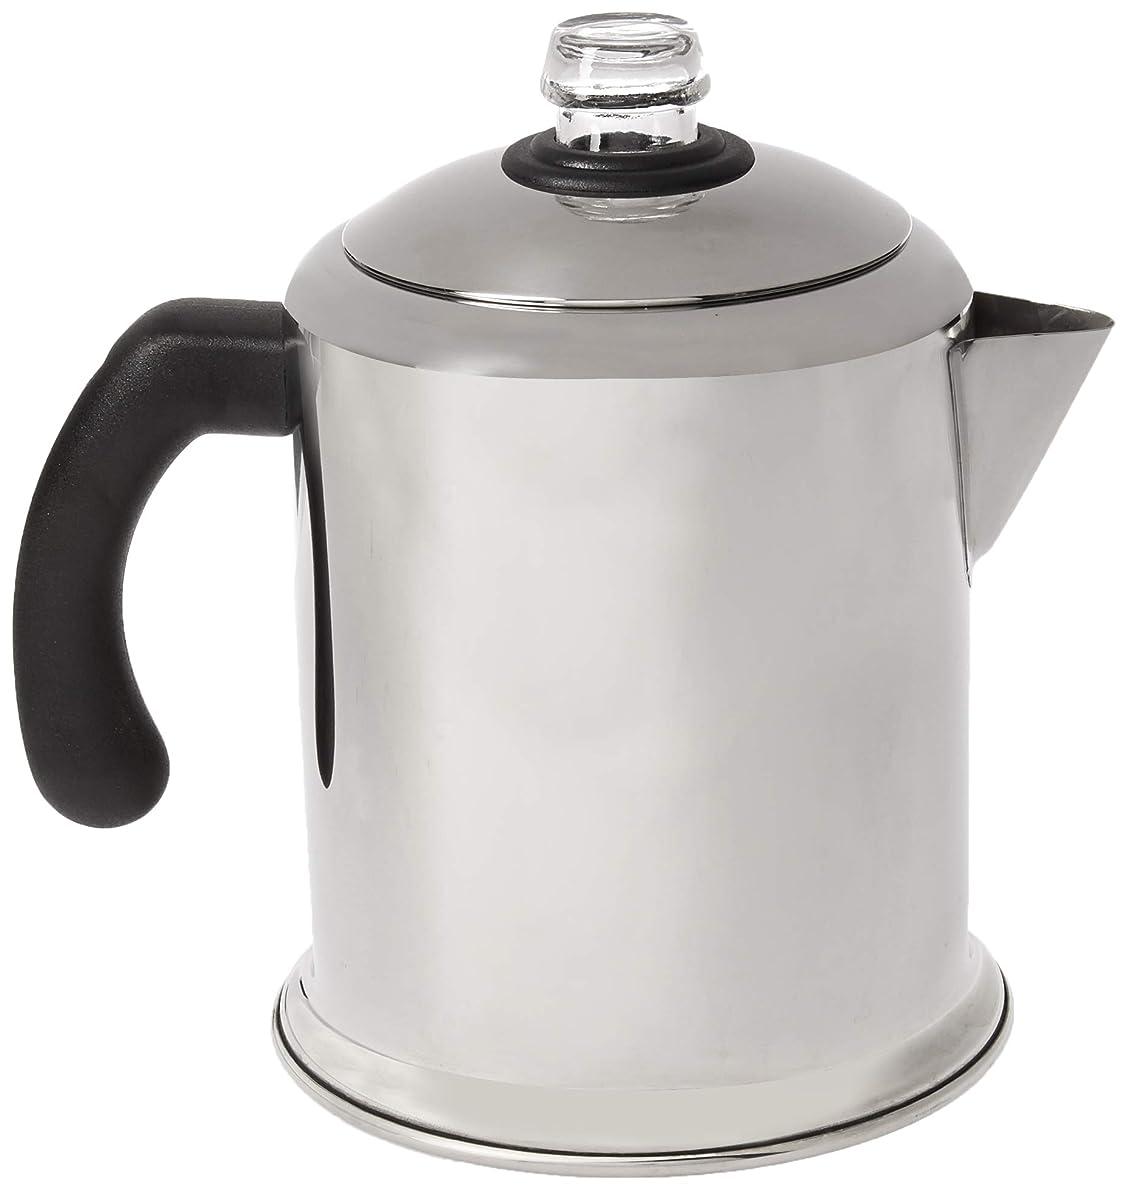 Farberware 50124 Classic Stainless Steel Yosemite 8-Cup Coffee Percolator,